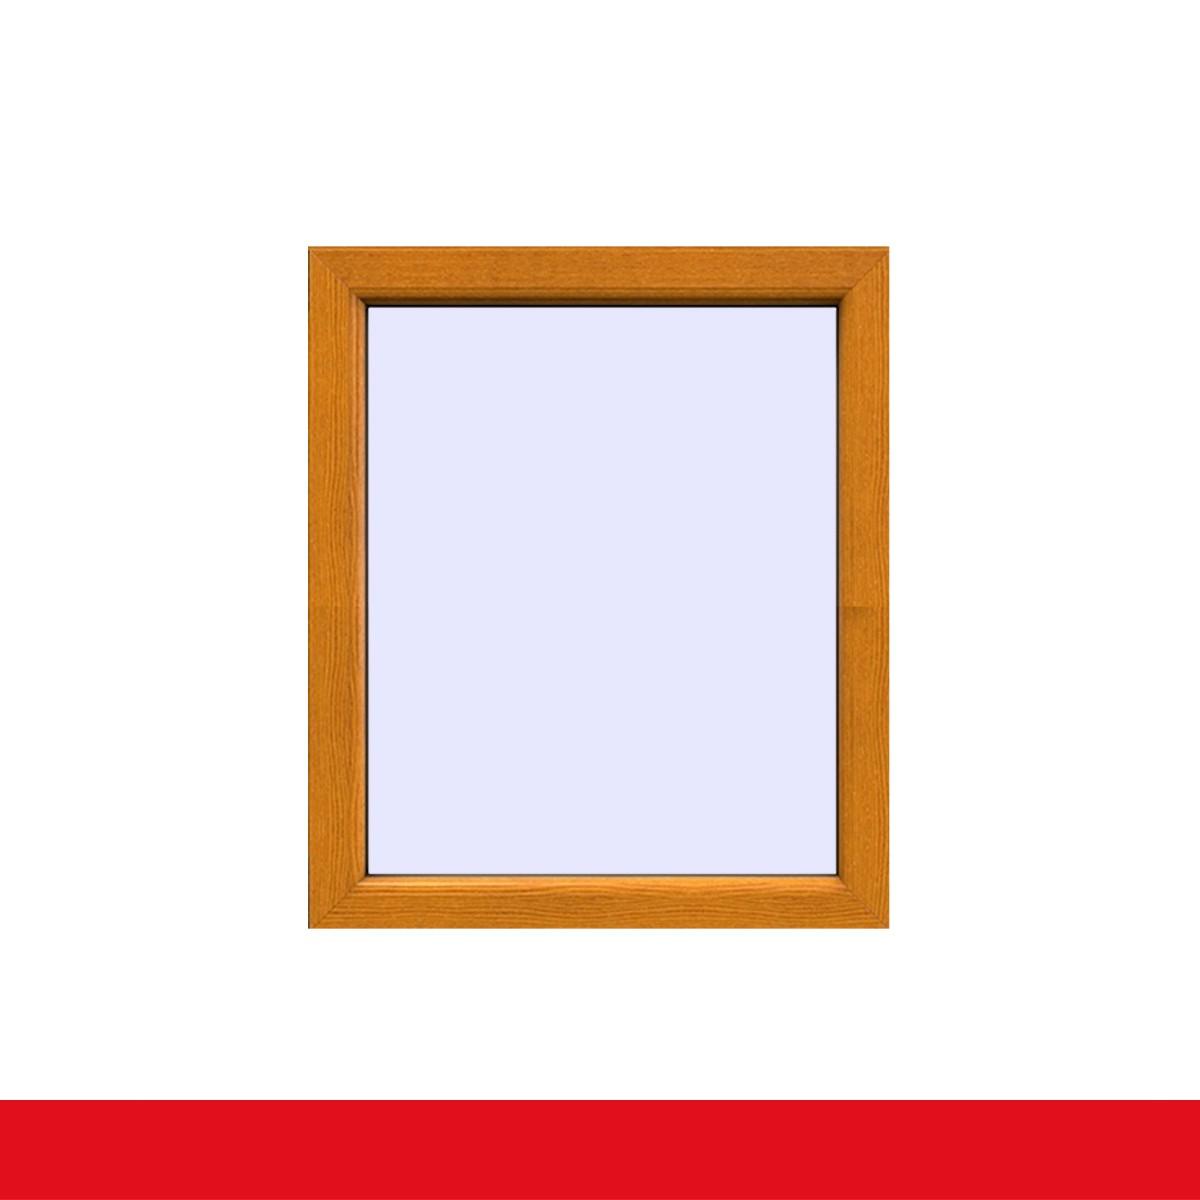 Festverglasung Fenster Oregon beidseitig 1 flg. Fest im Rahmen Shop ...